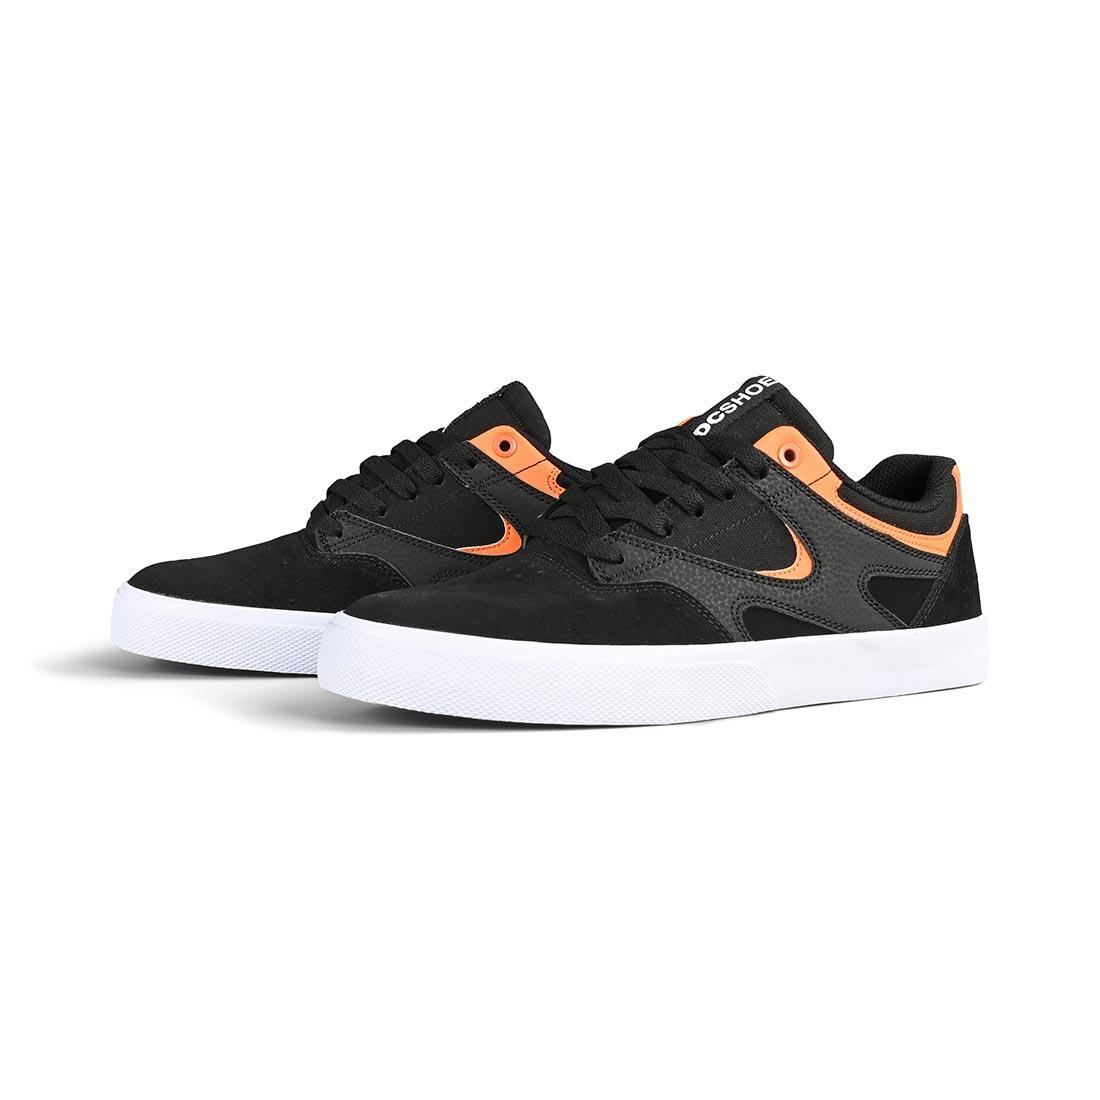 Dc shoes kalis vulc s black orange 2021 scarpe skate new 40 41 42 43